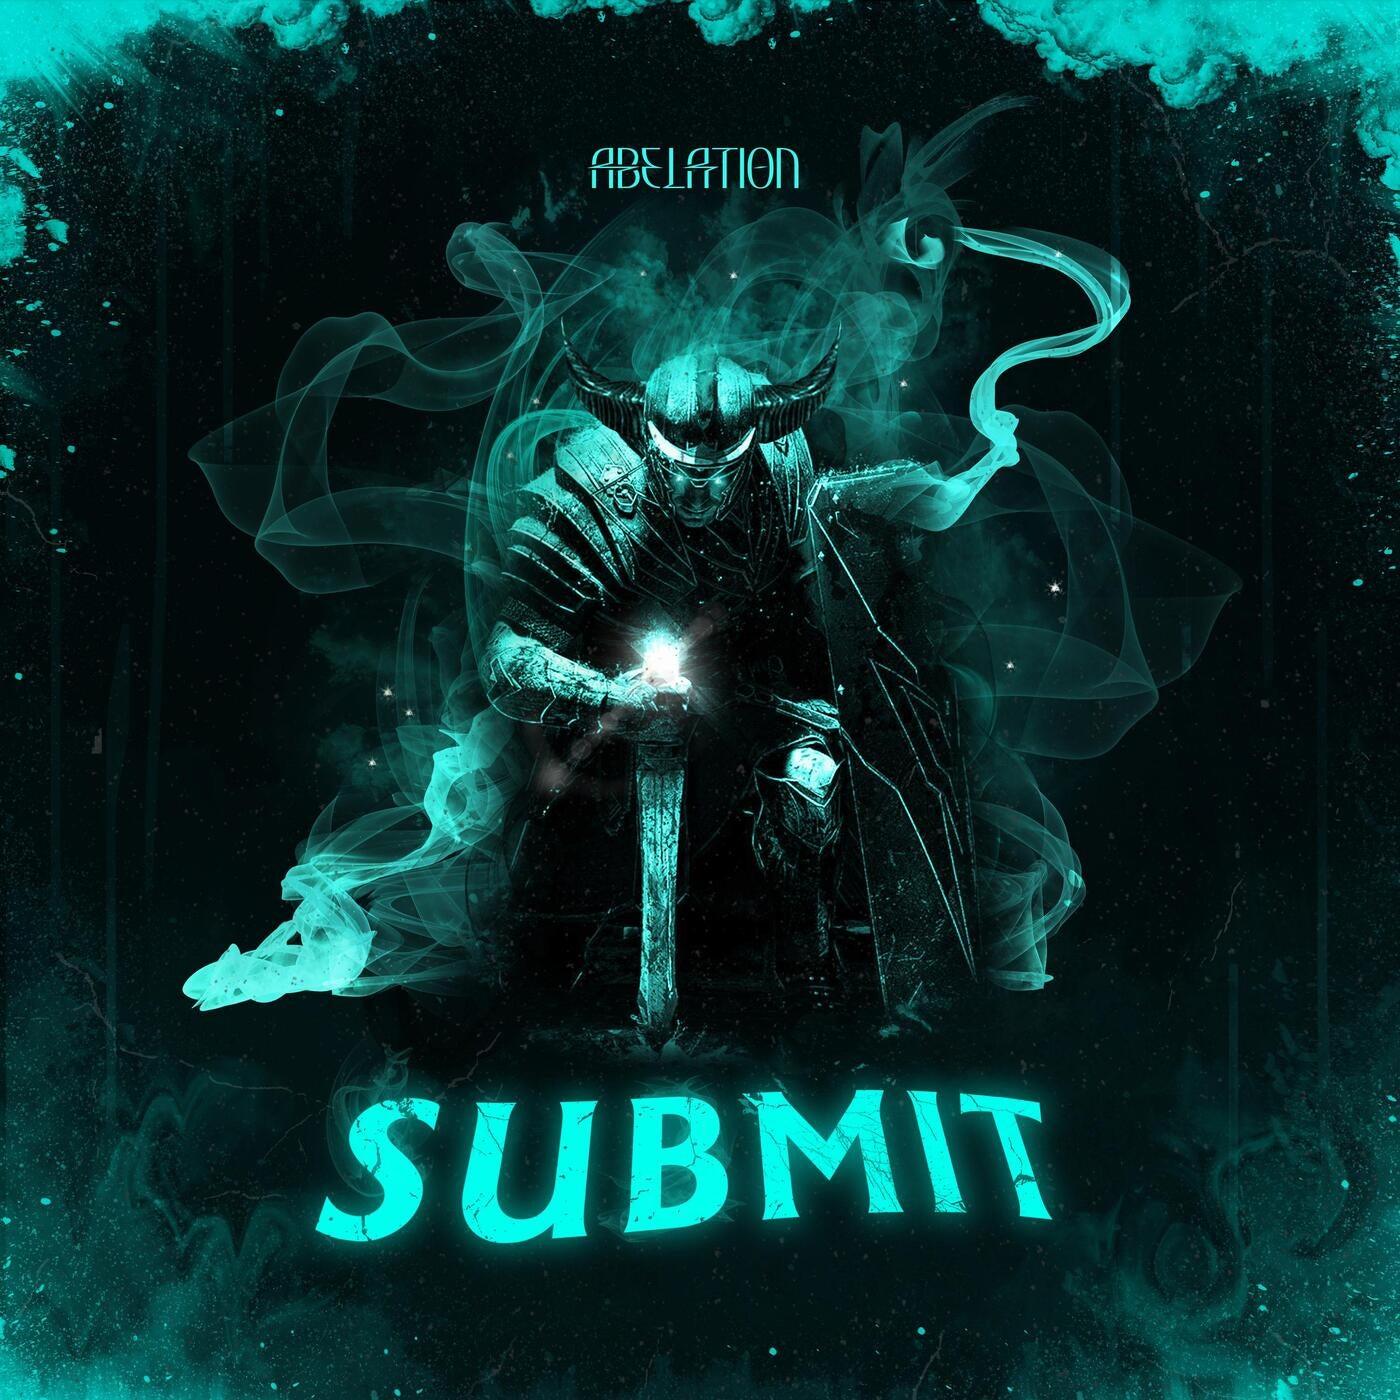 Submit (Original Mix)